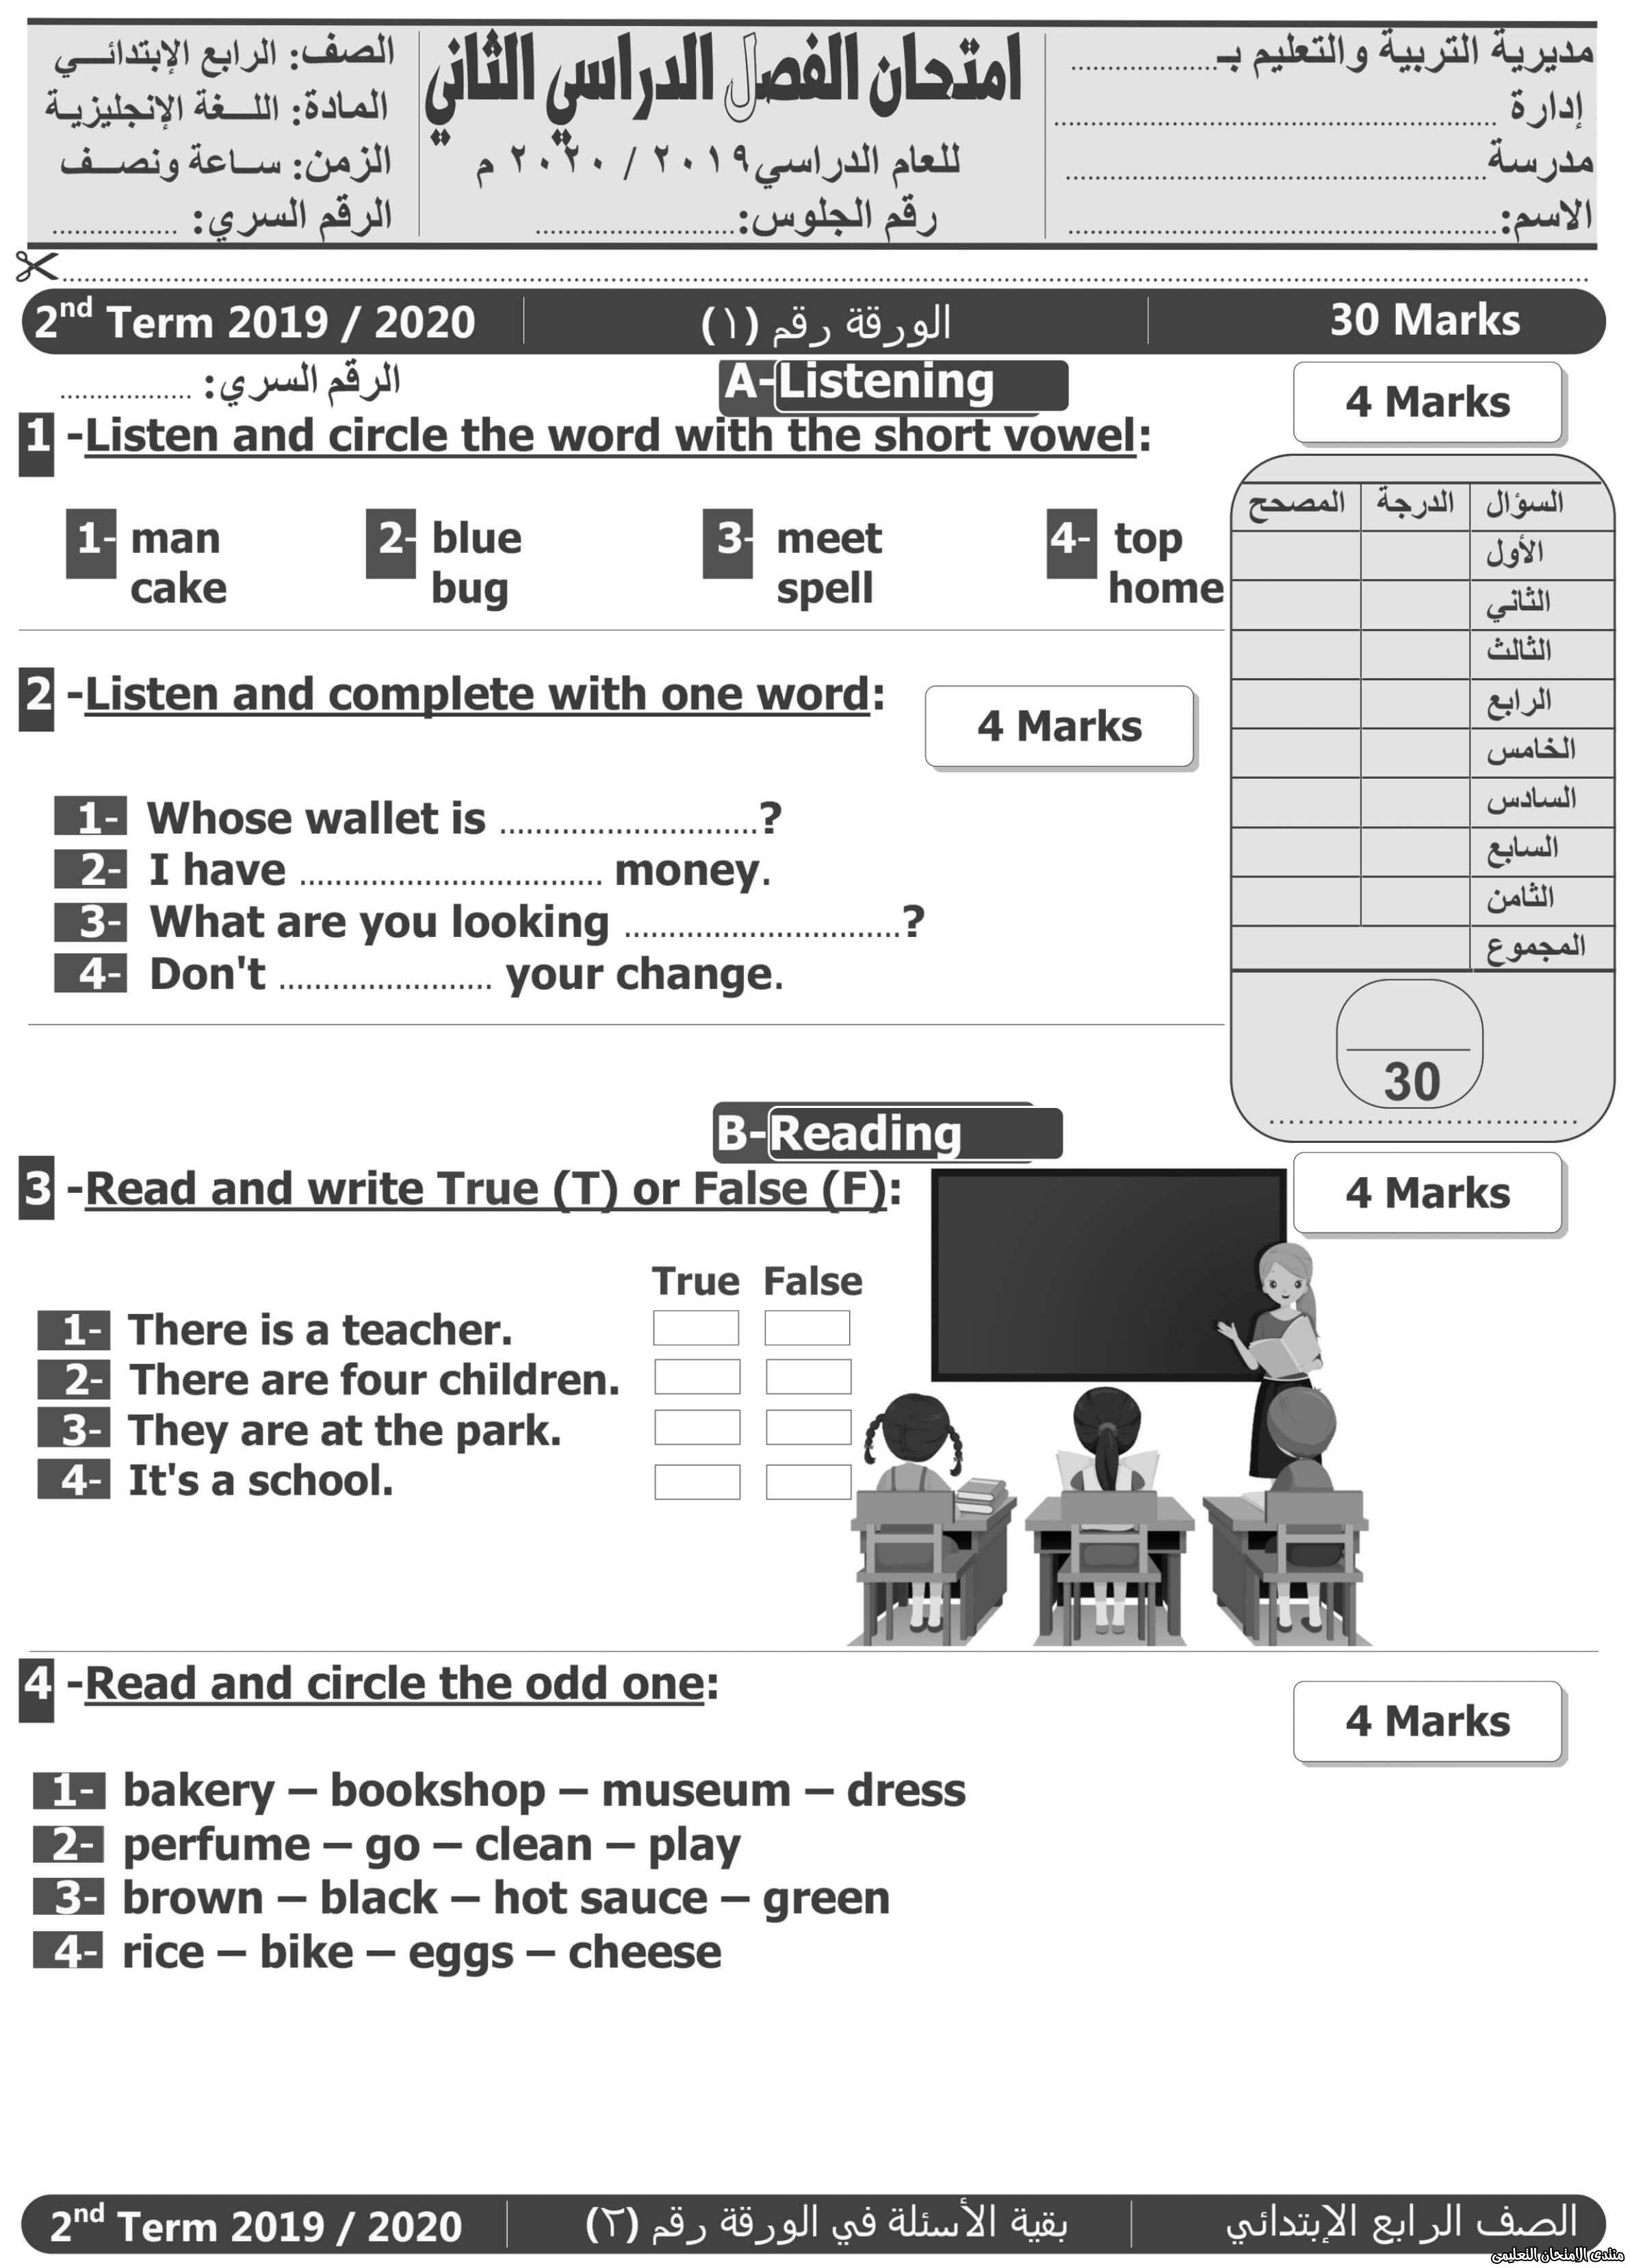 exam-eg.com_158445838452211.jpg